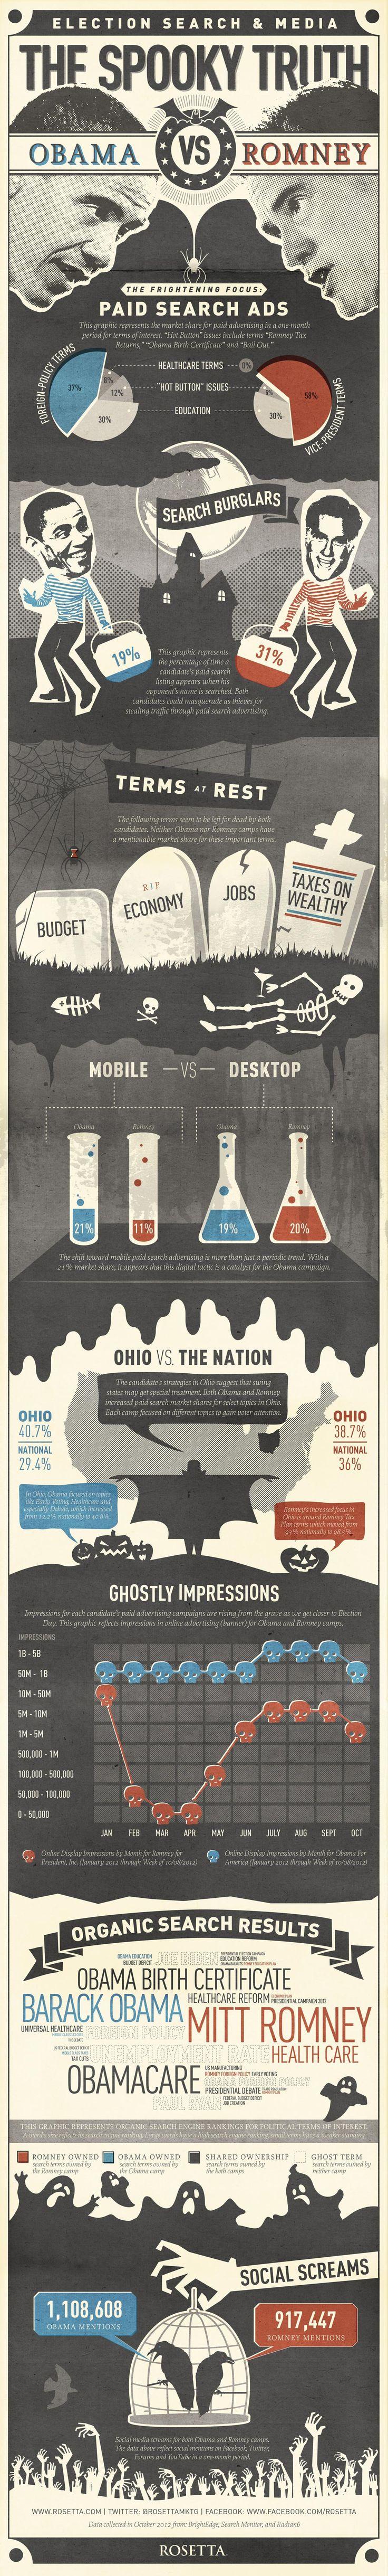 Political Infographic – Presidential Online Marketing Efforts